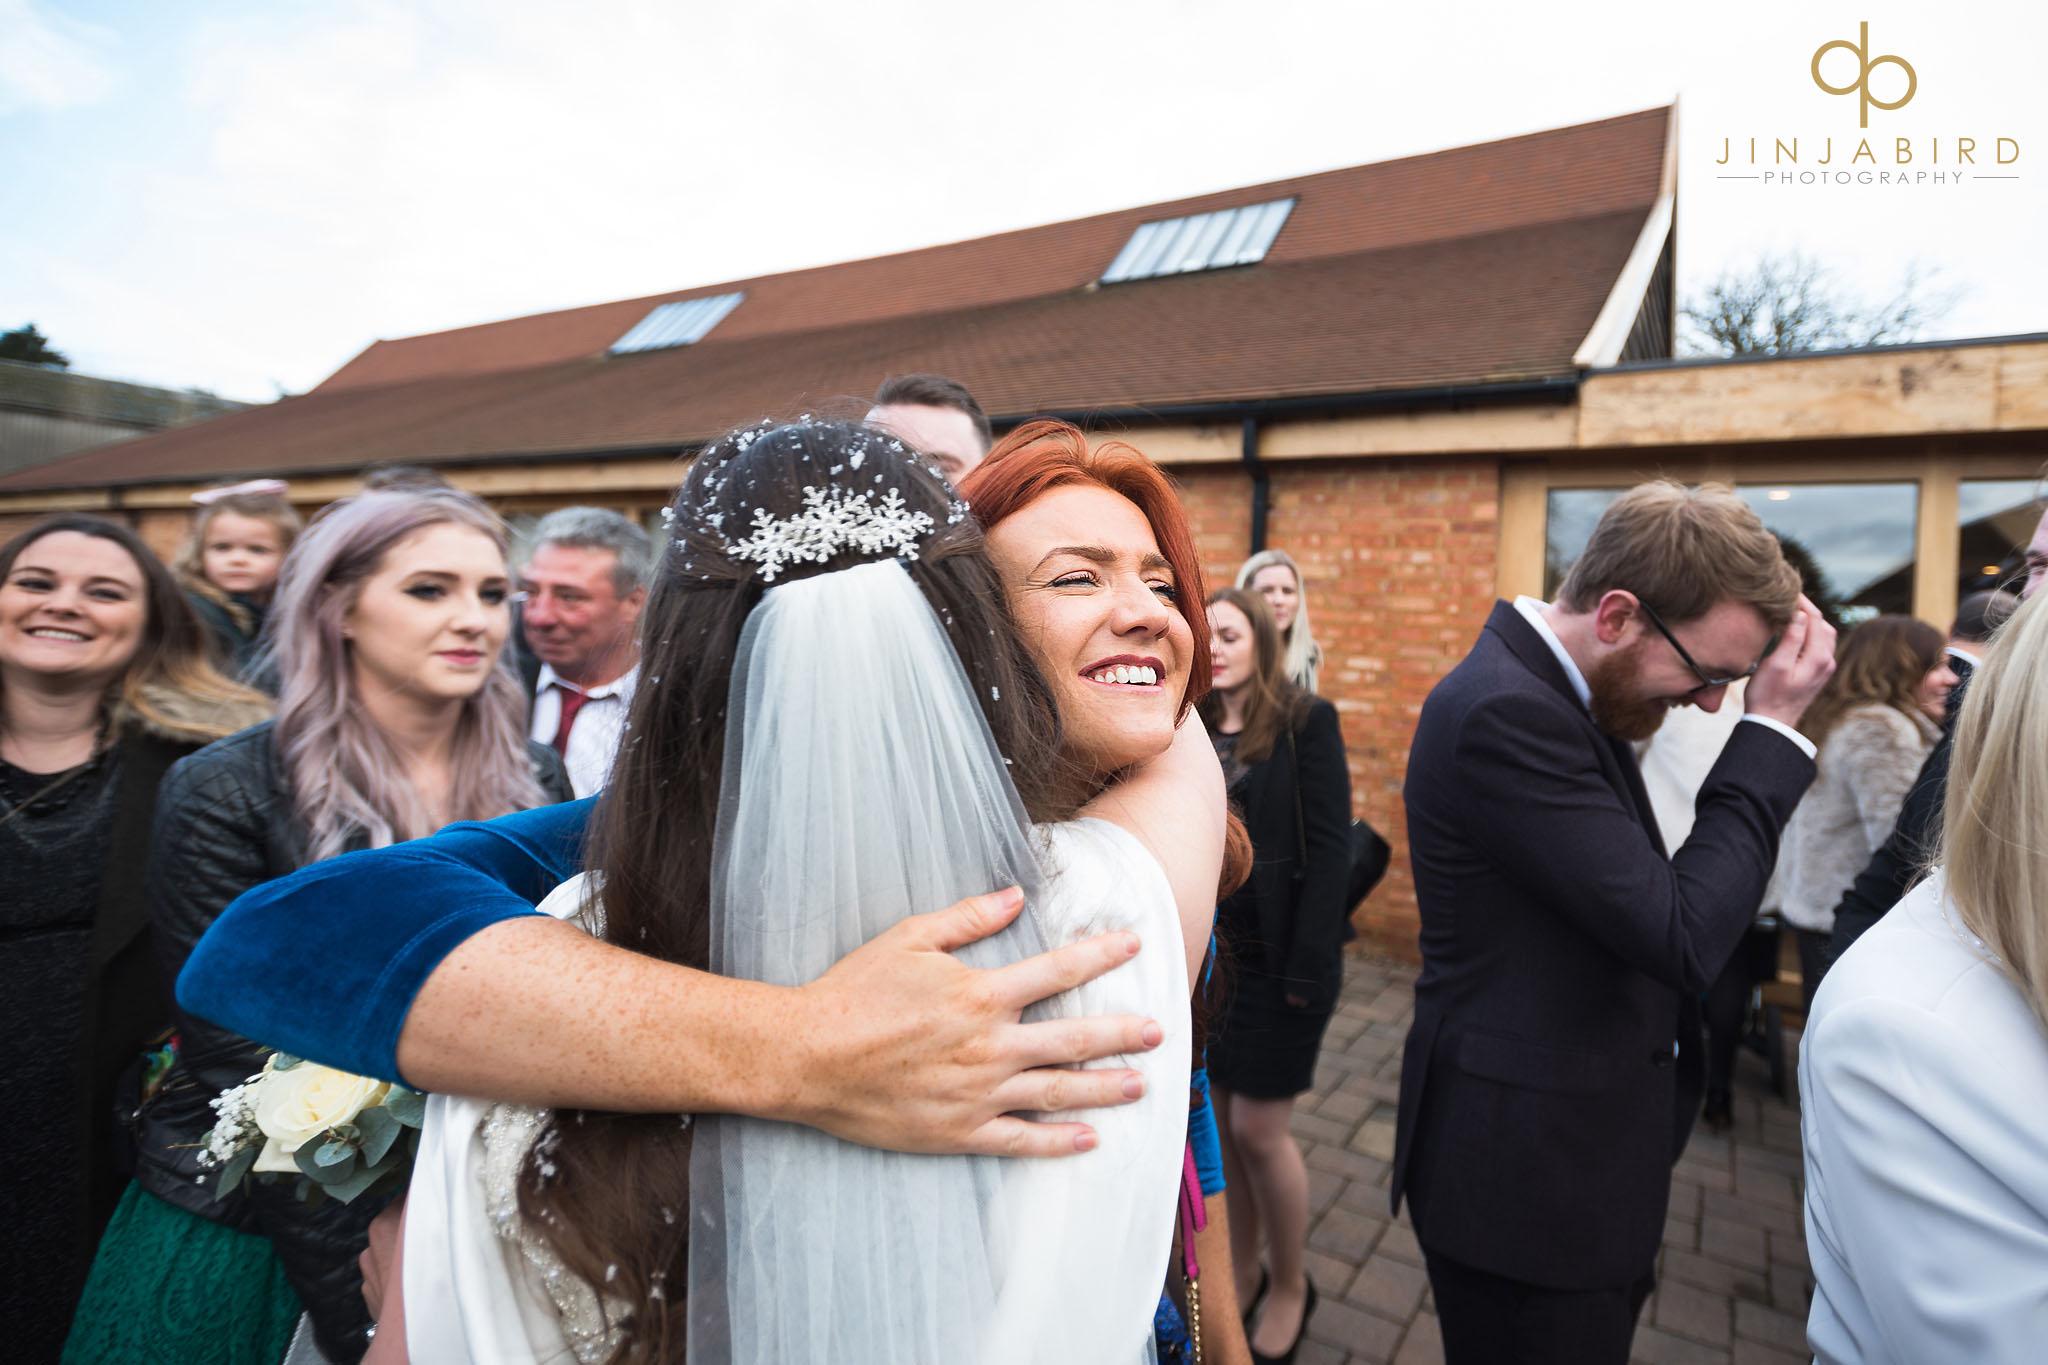 wedding guest squeezes bride